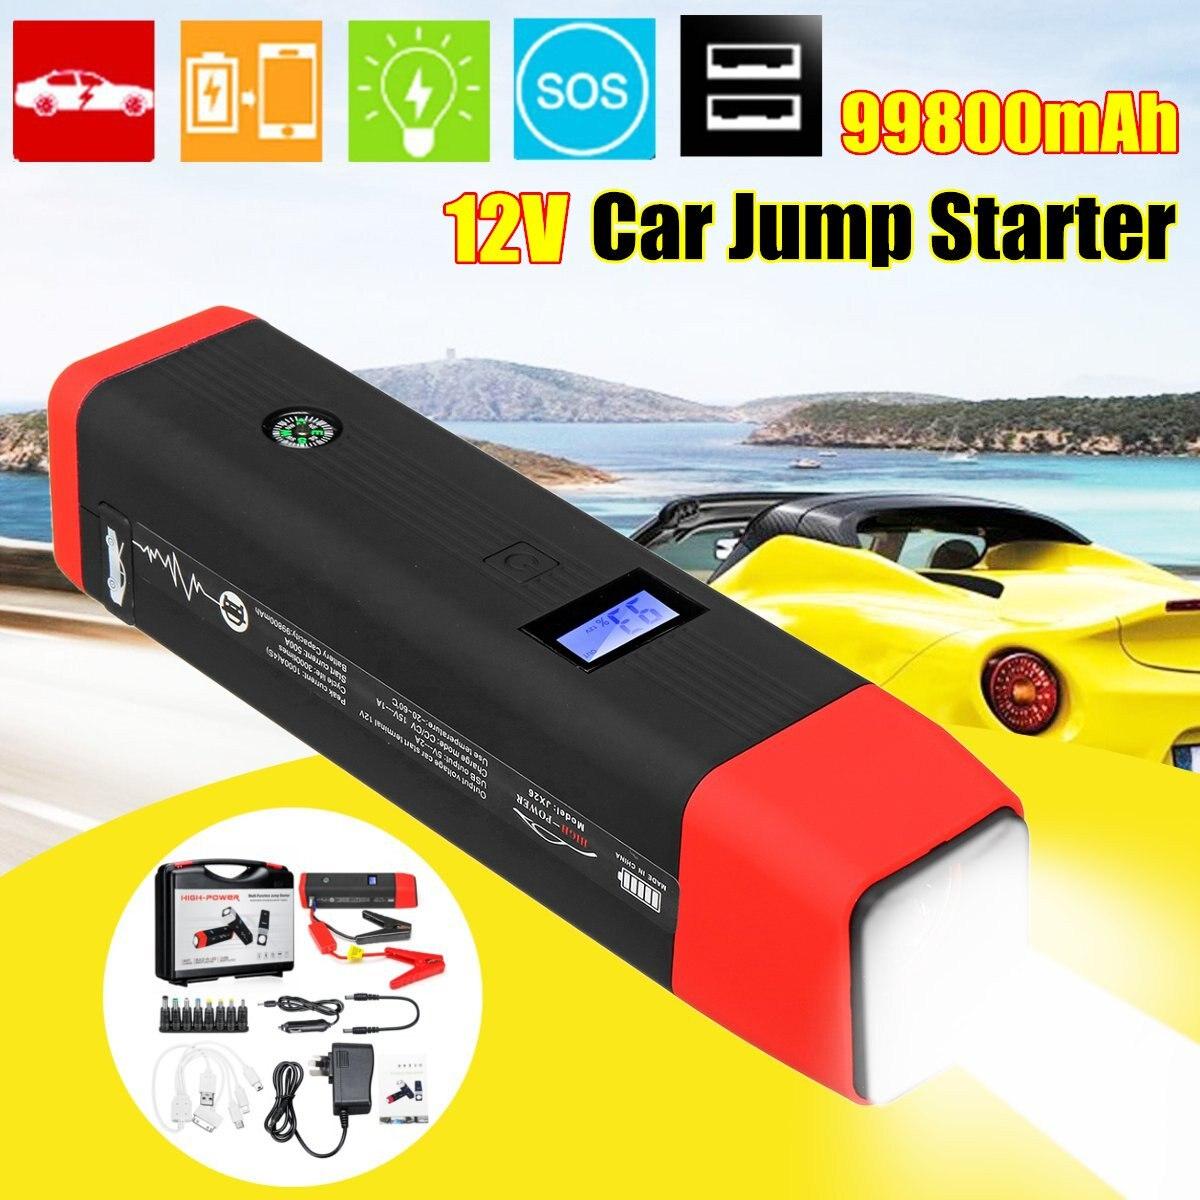 99800mAh 12V 2USB Start Best 1000A Peaks Current Car Jump Starter Starting Power Bank Auto Battery